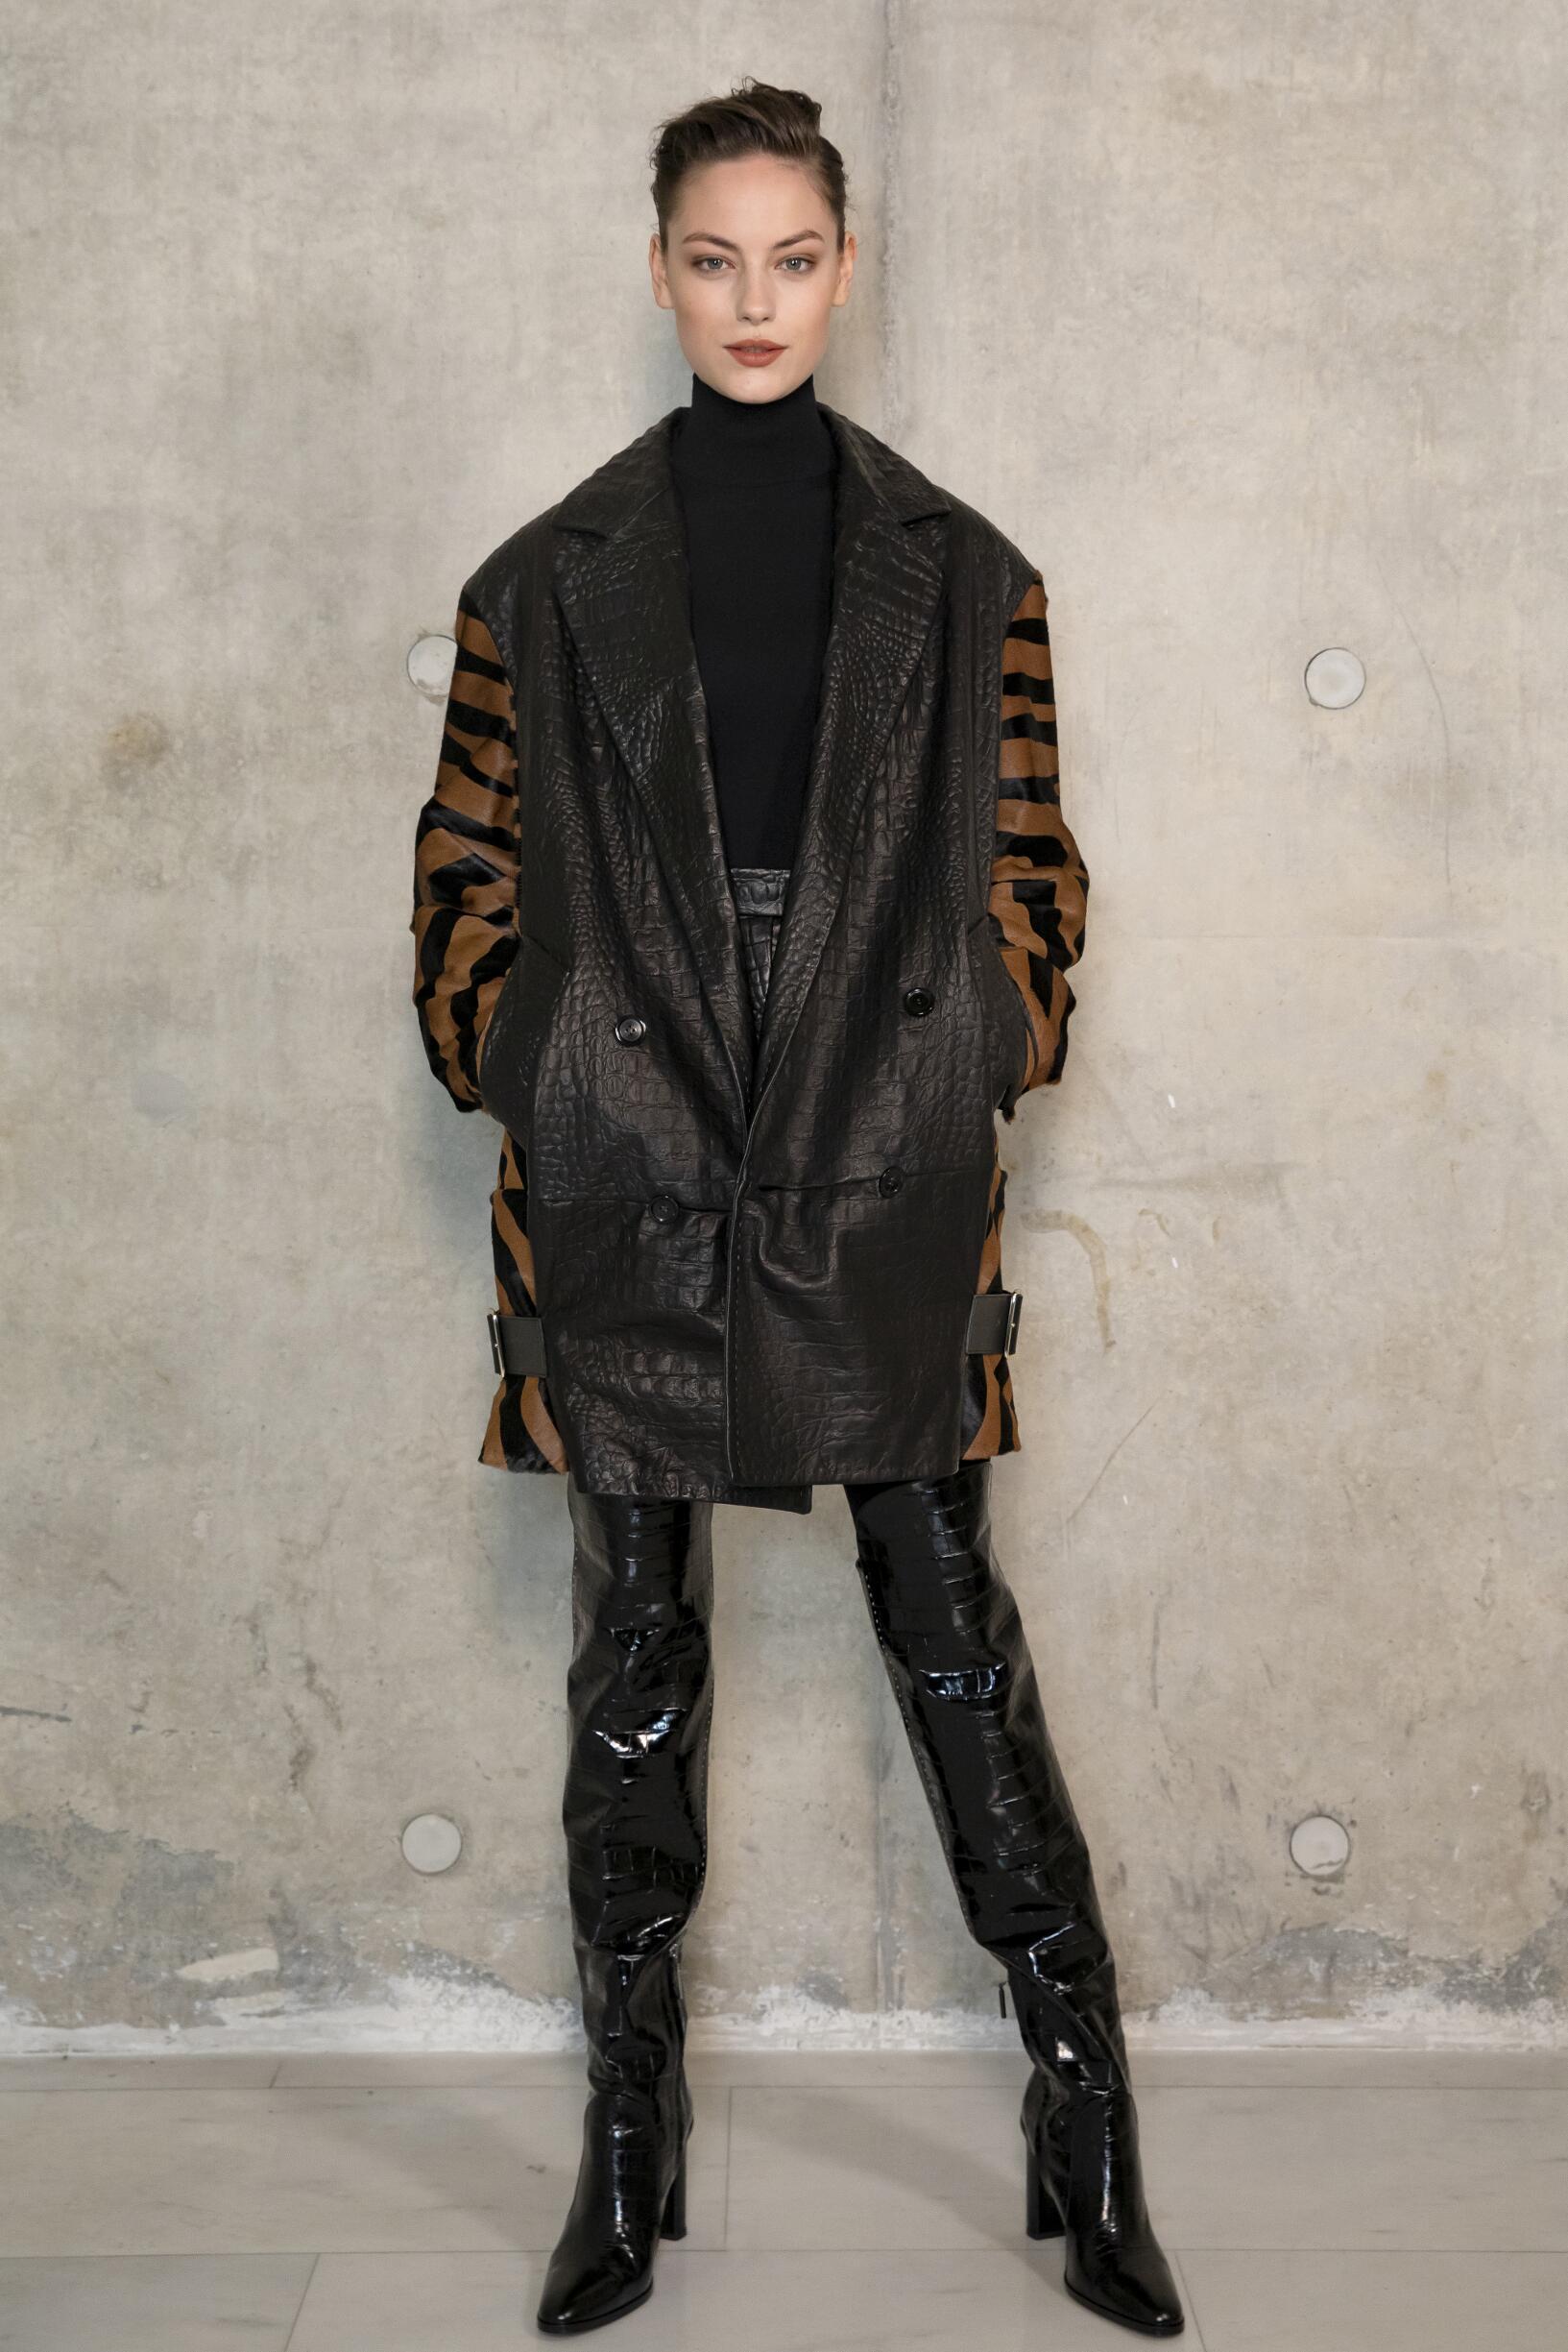 Backstage Max Mara Model